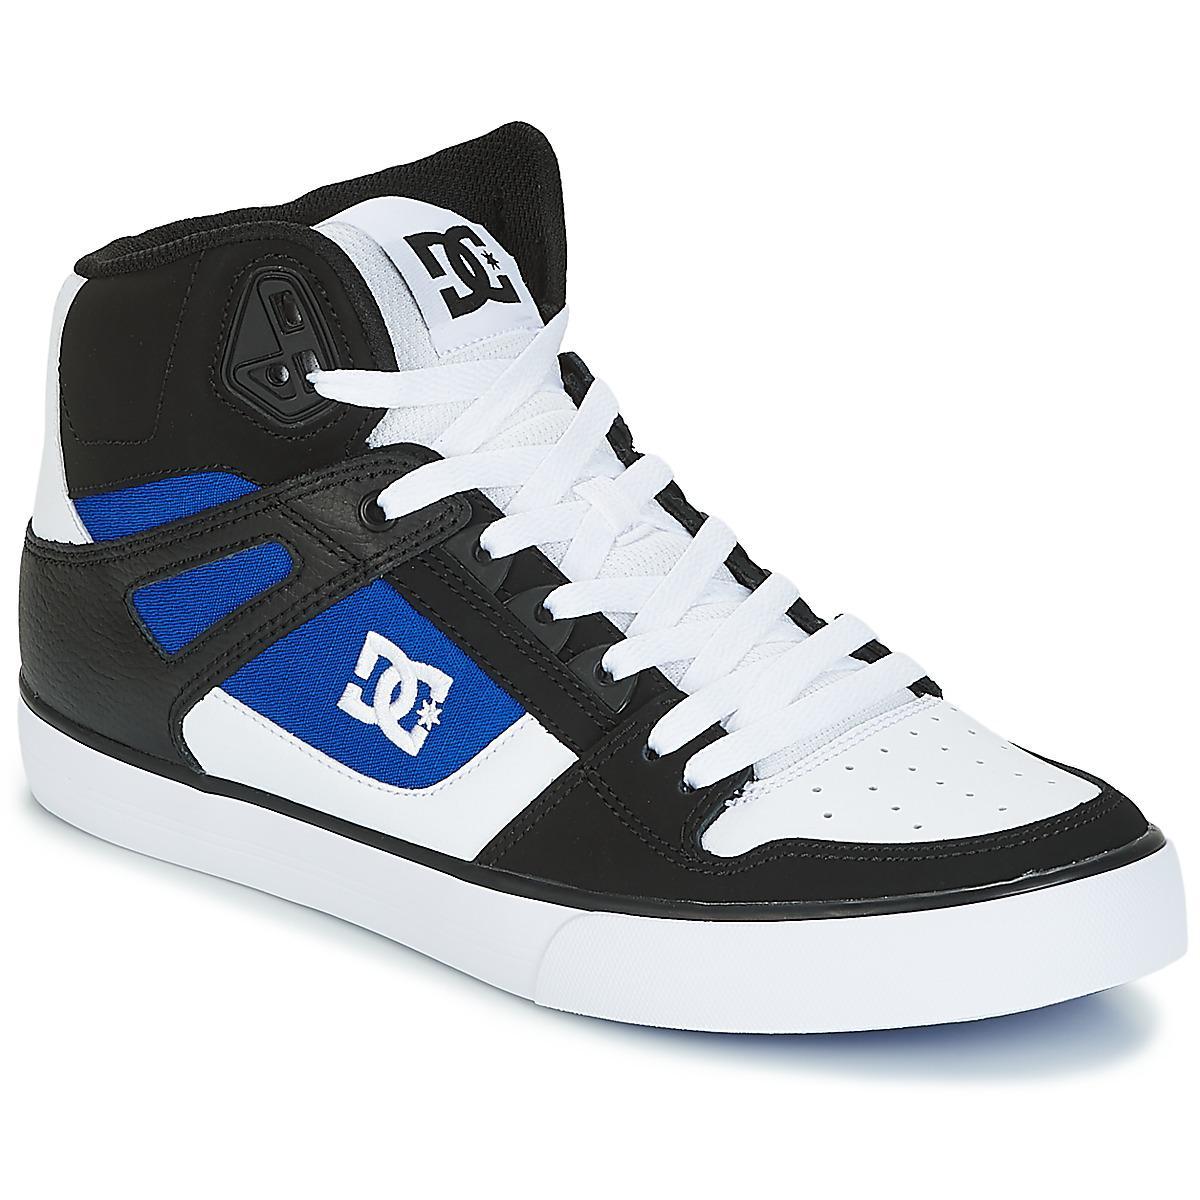 517cd1803c DC Shoes Pure Ht Wc M Shoe Xwbk Men's Shoes (high-top Trainers) In ...